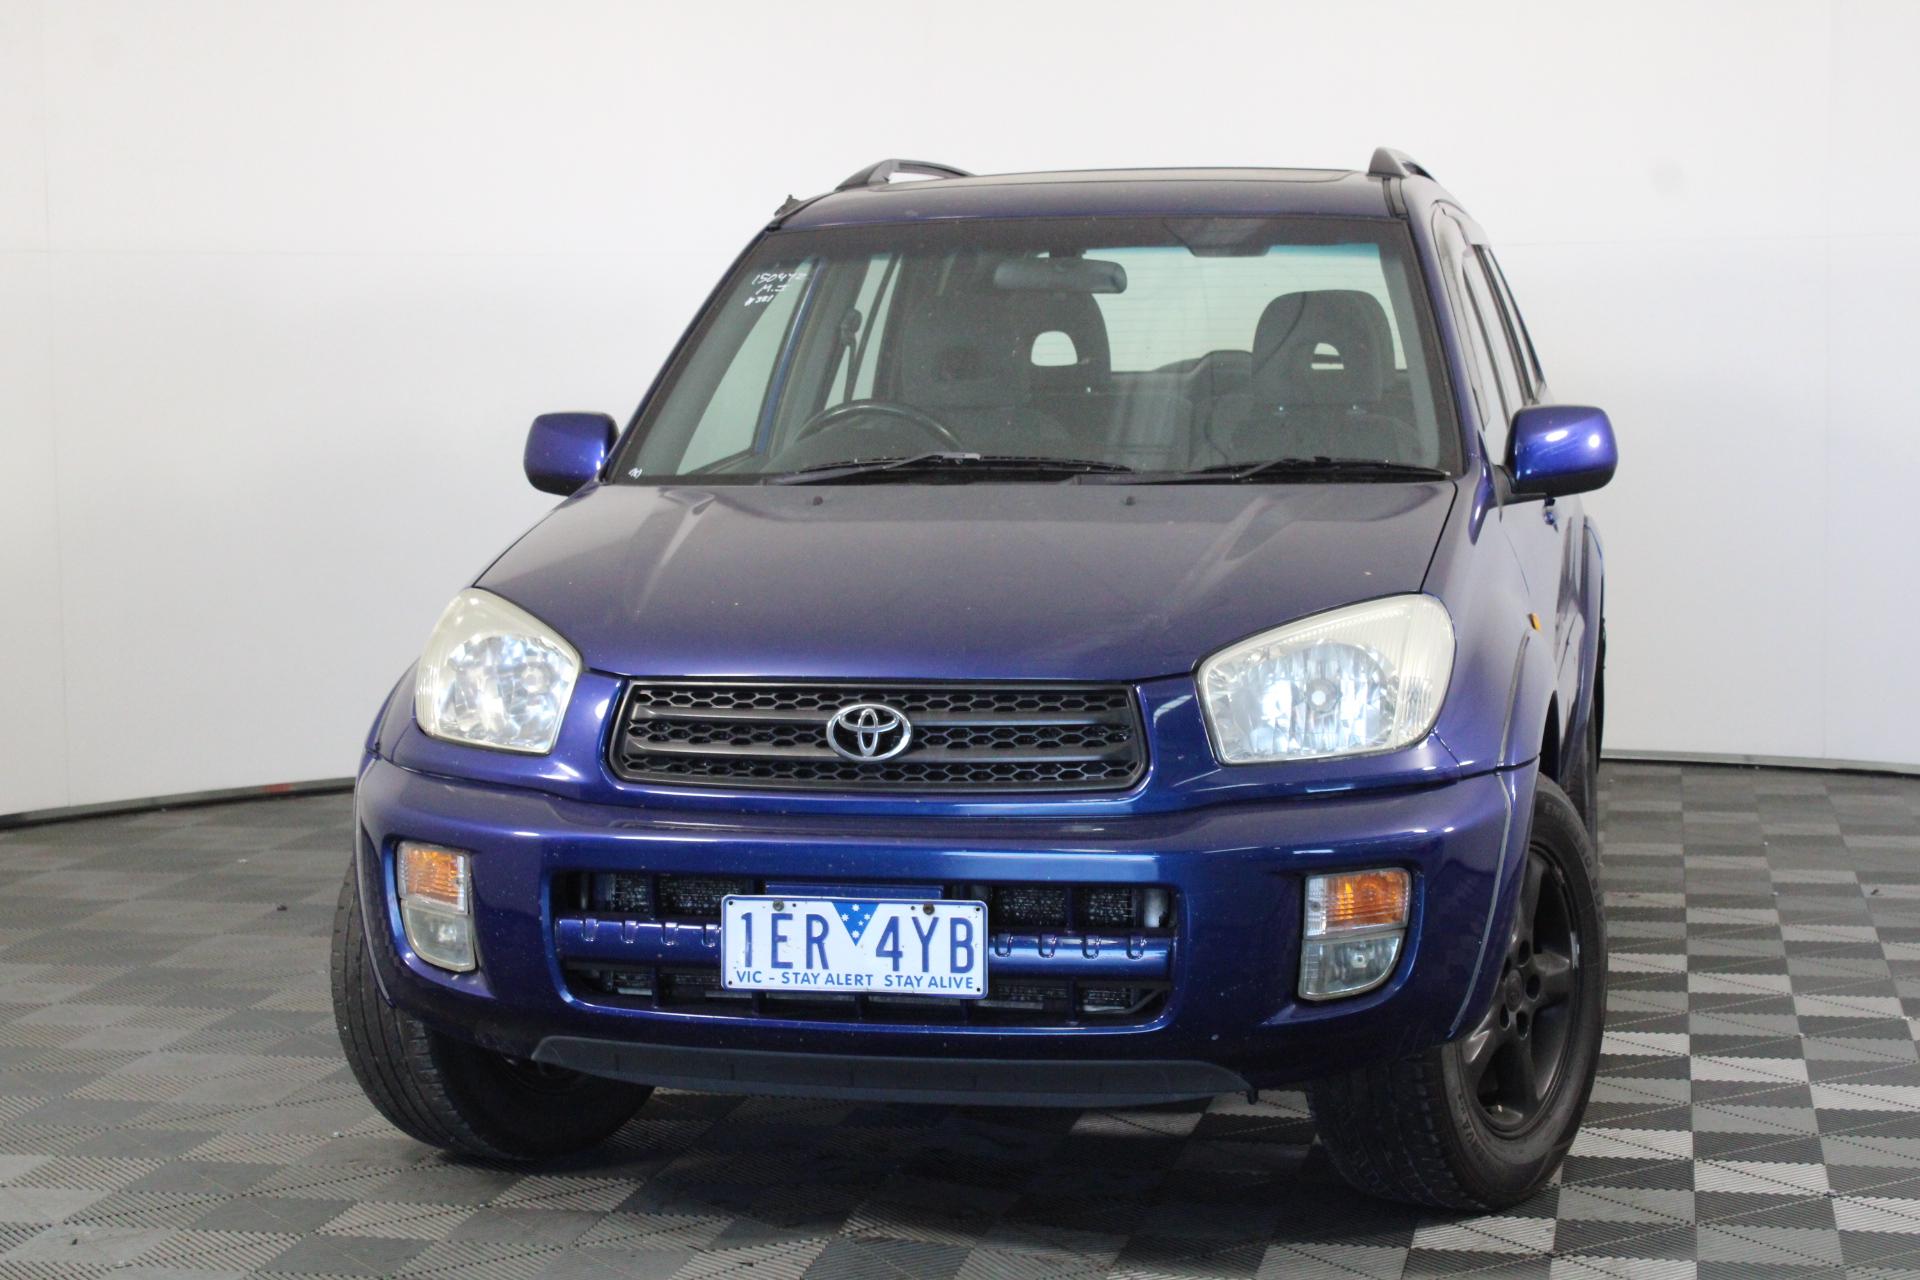 2001 Toyota Rav 4 Cruiser (4x4) Automatic Wagon